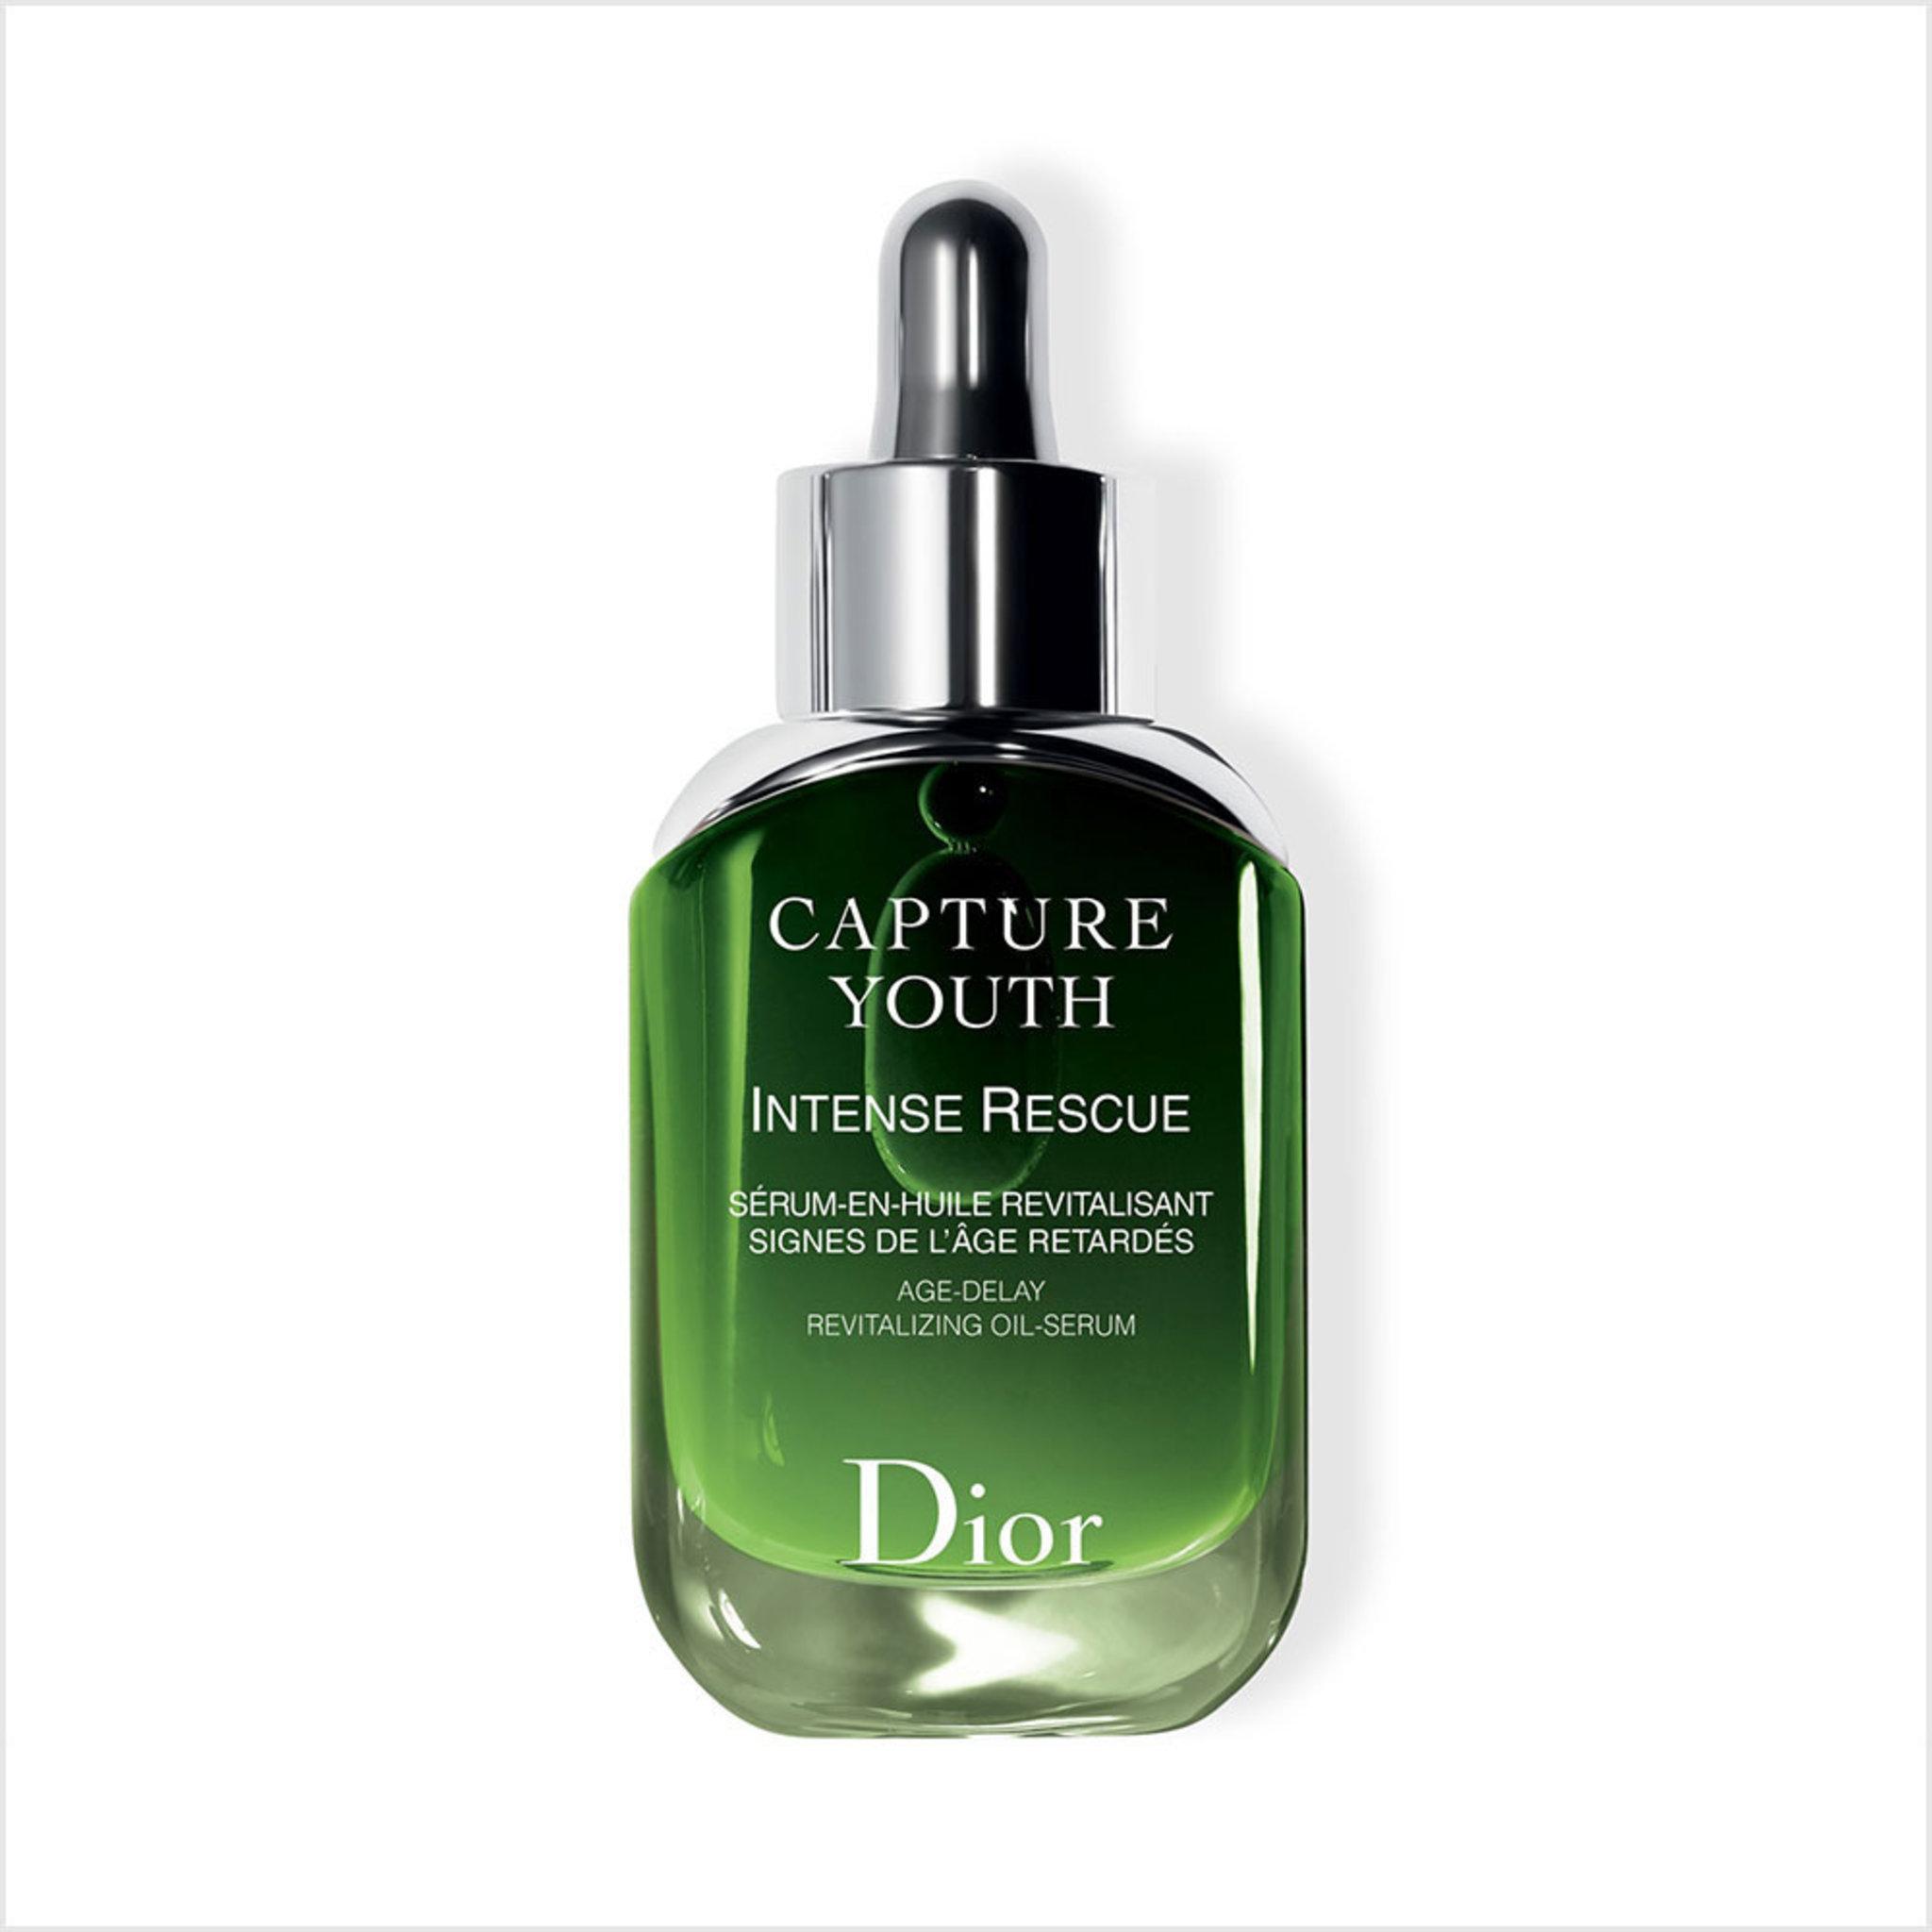 Capture Youth Serum Oil, 30 ML